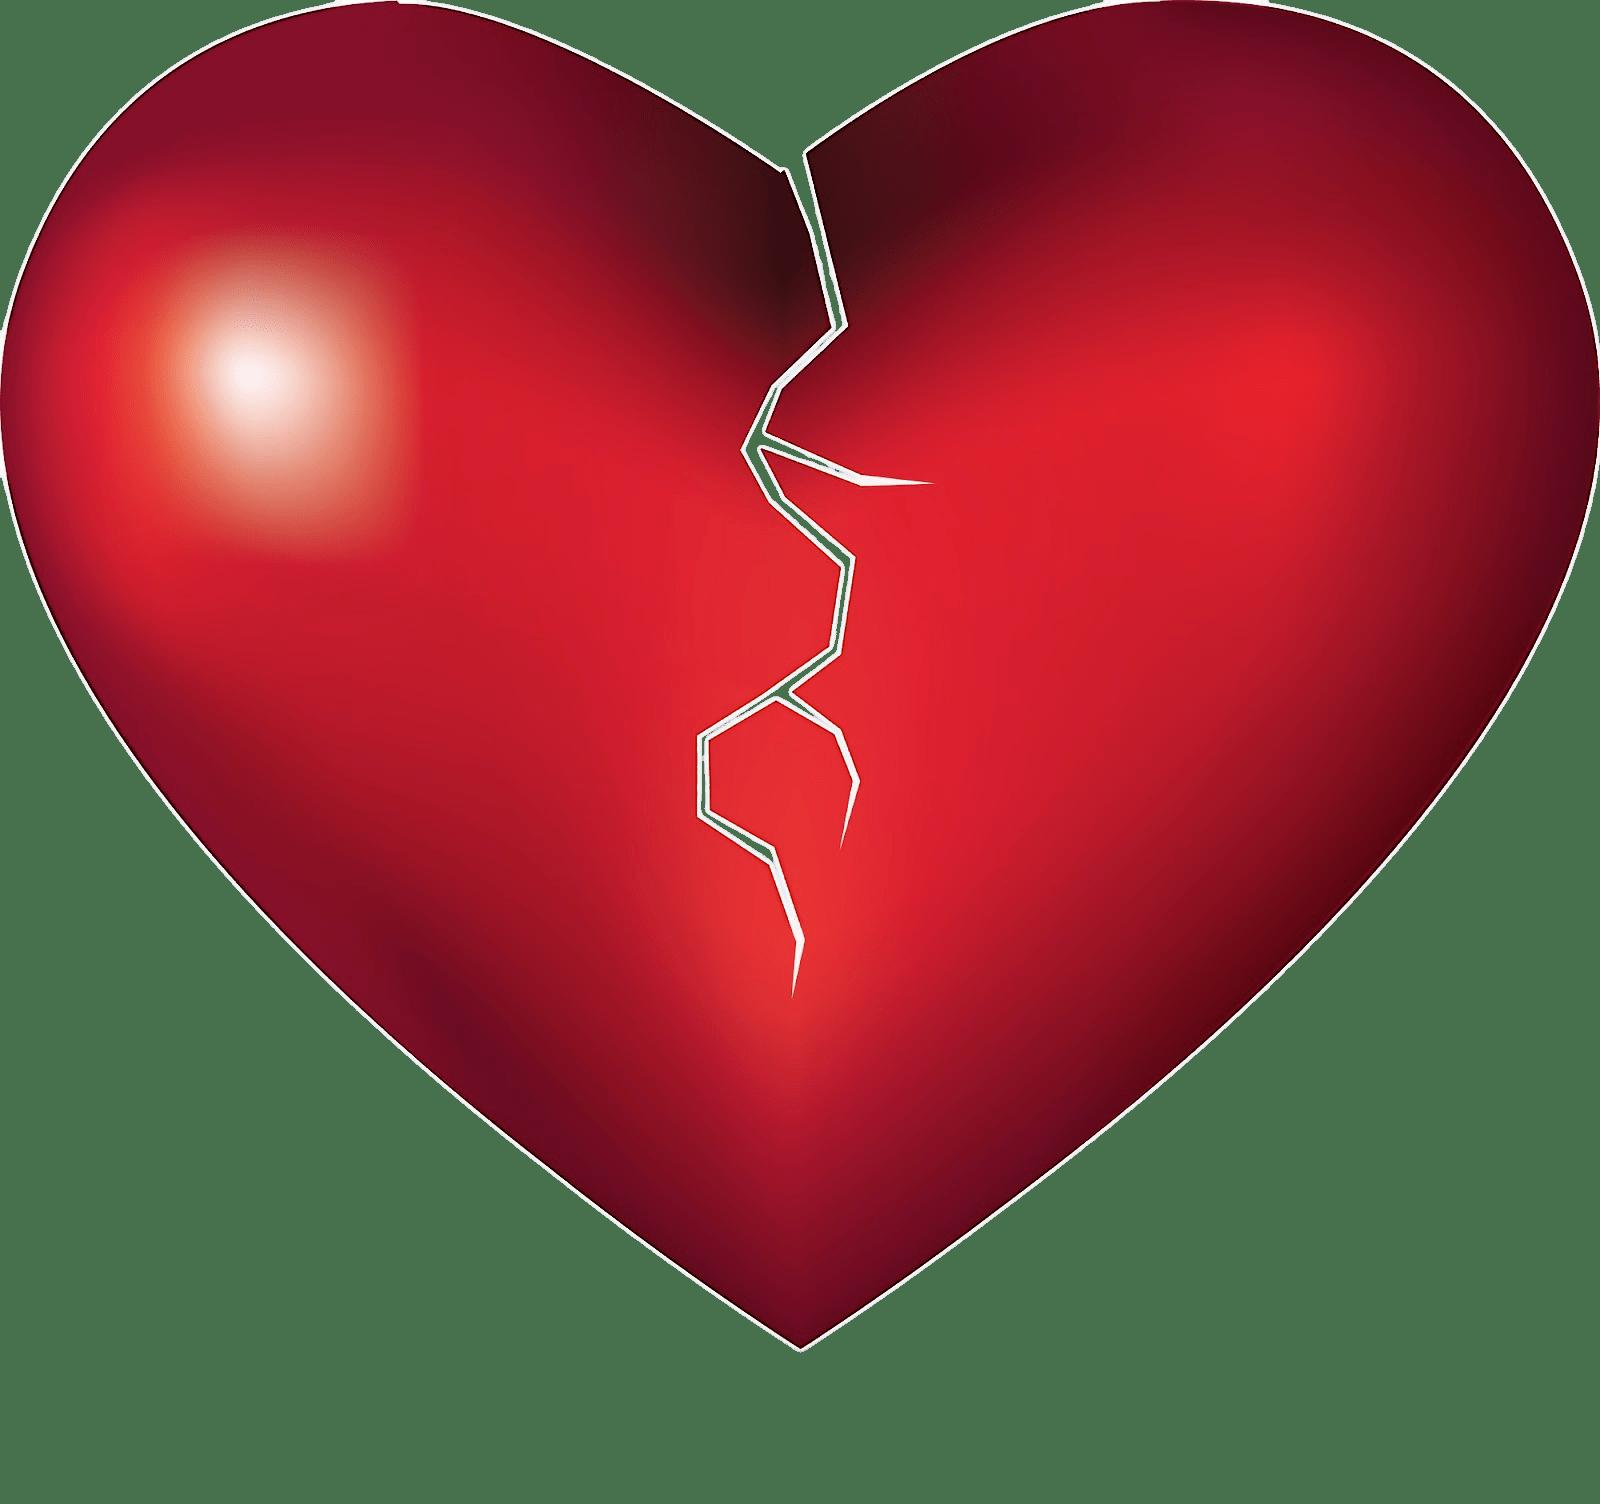 Breaking heart transparent png. People clipart broken hearted